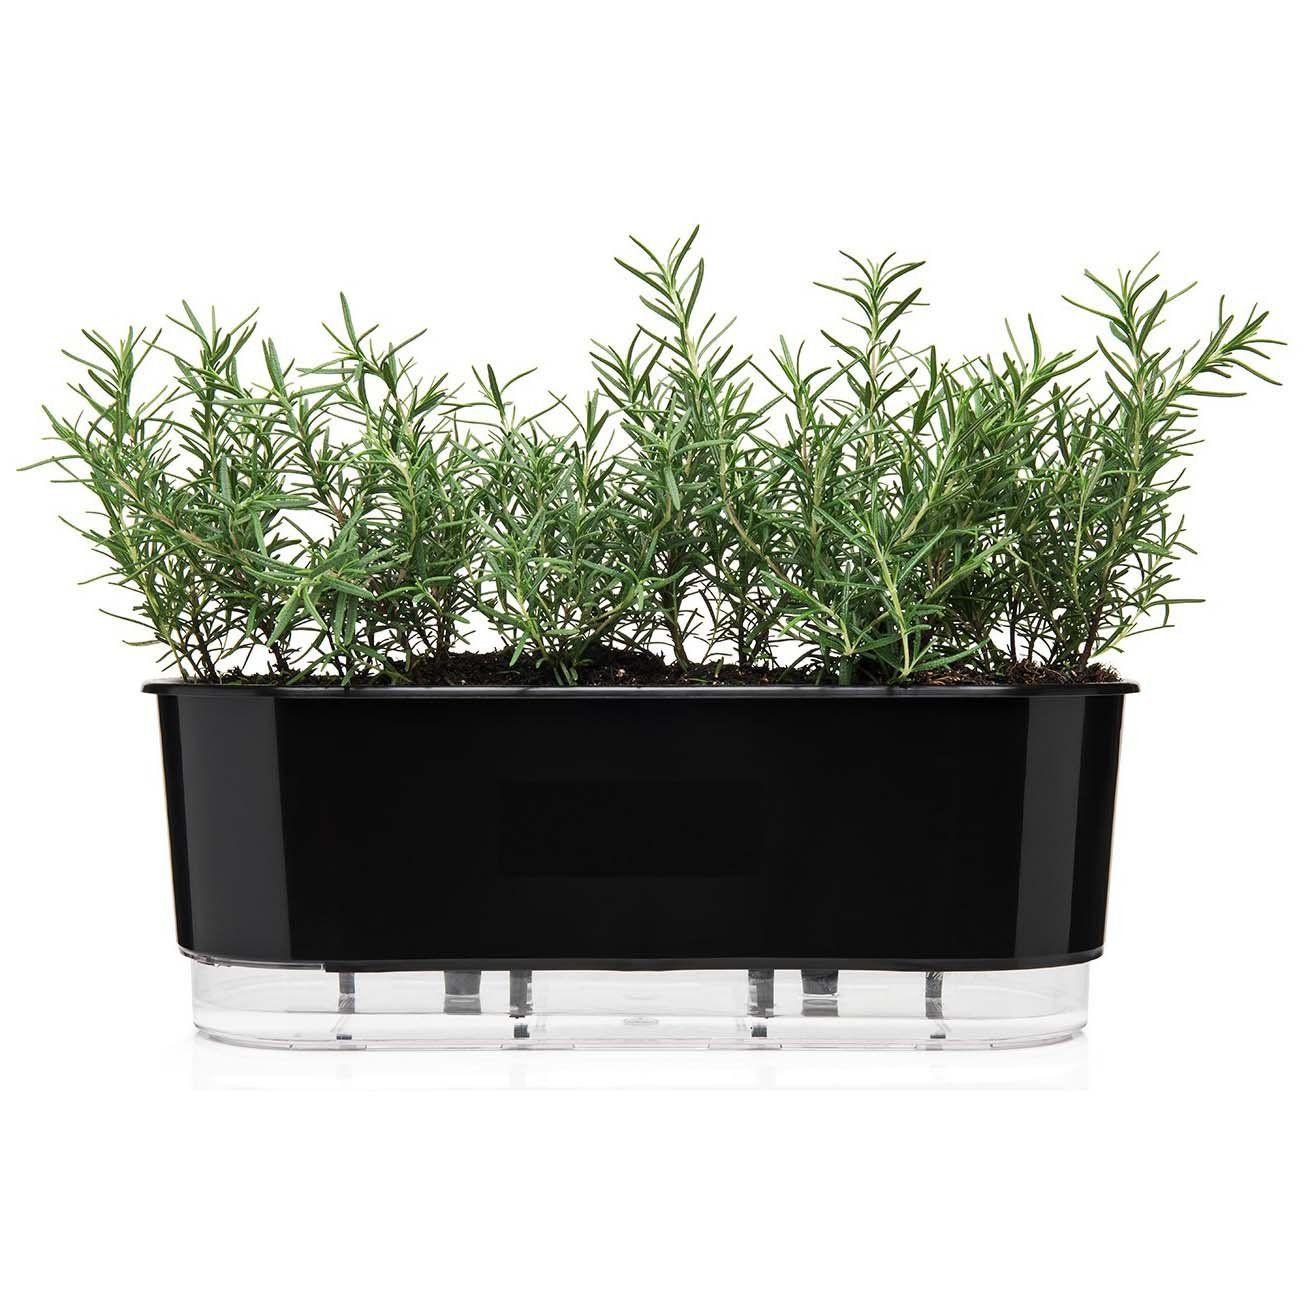 Jardineira Autoirrigável Preto 40cm  - Vasos Raiz Loja Oficial